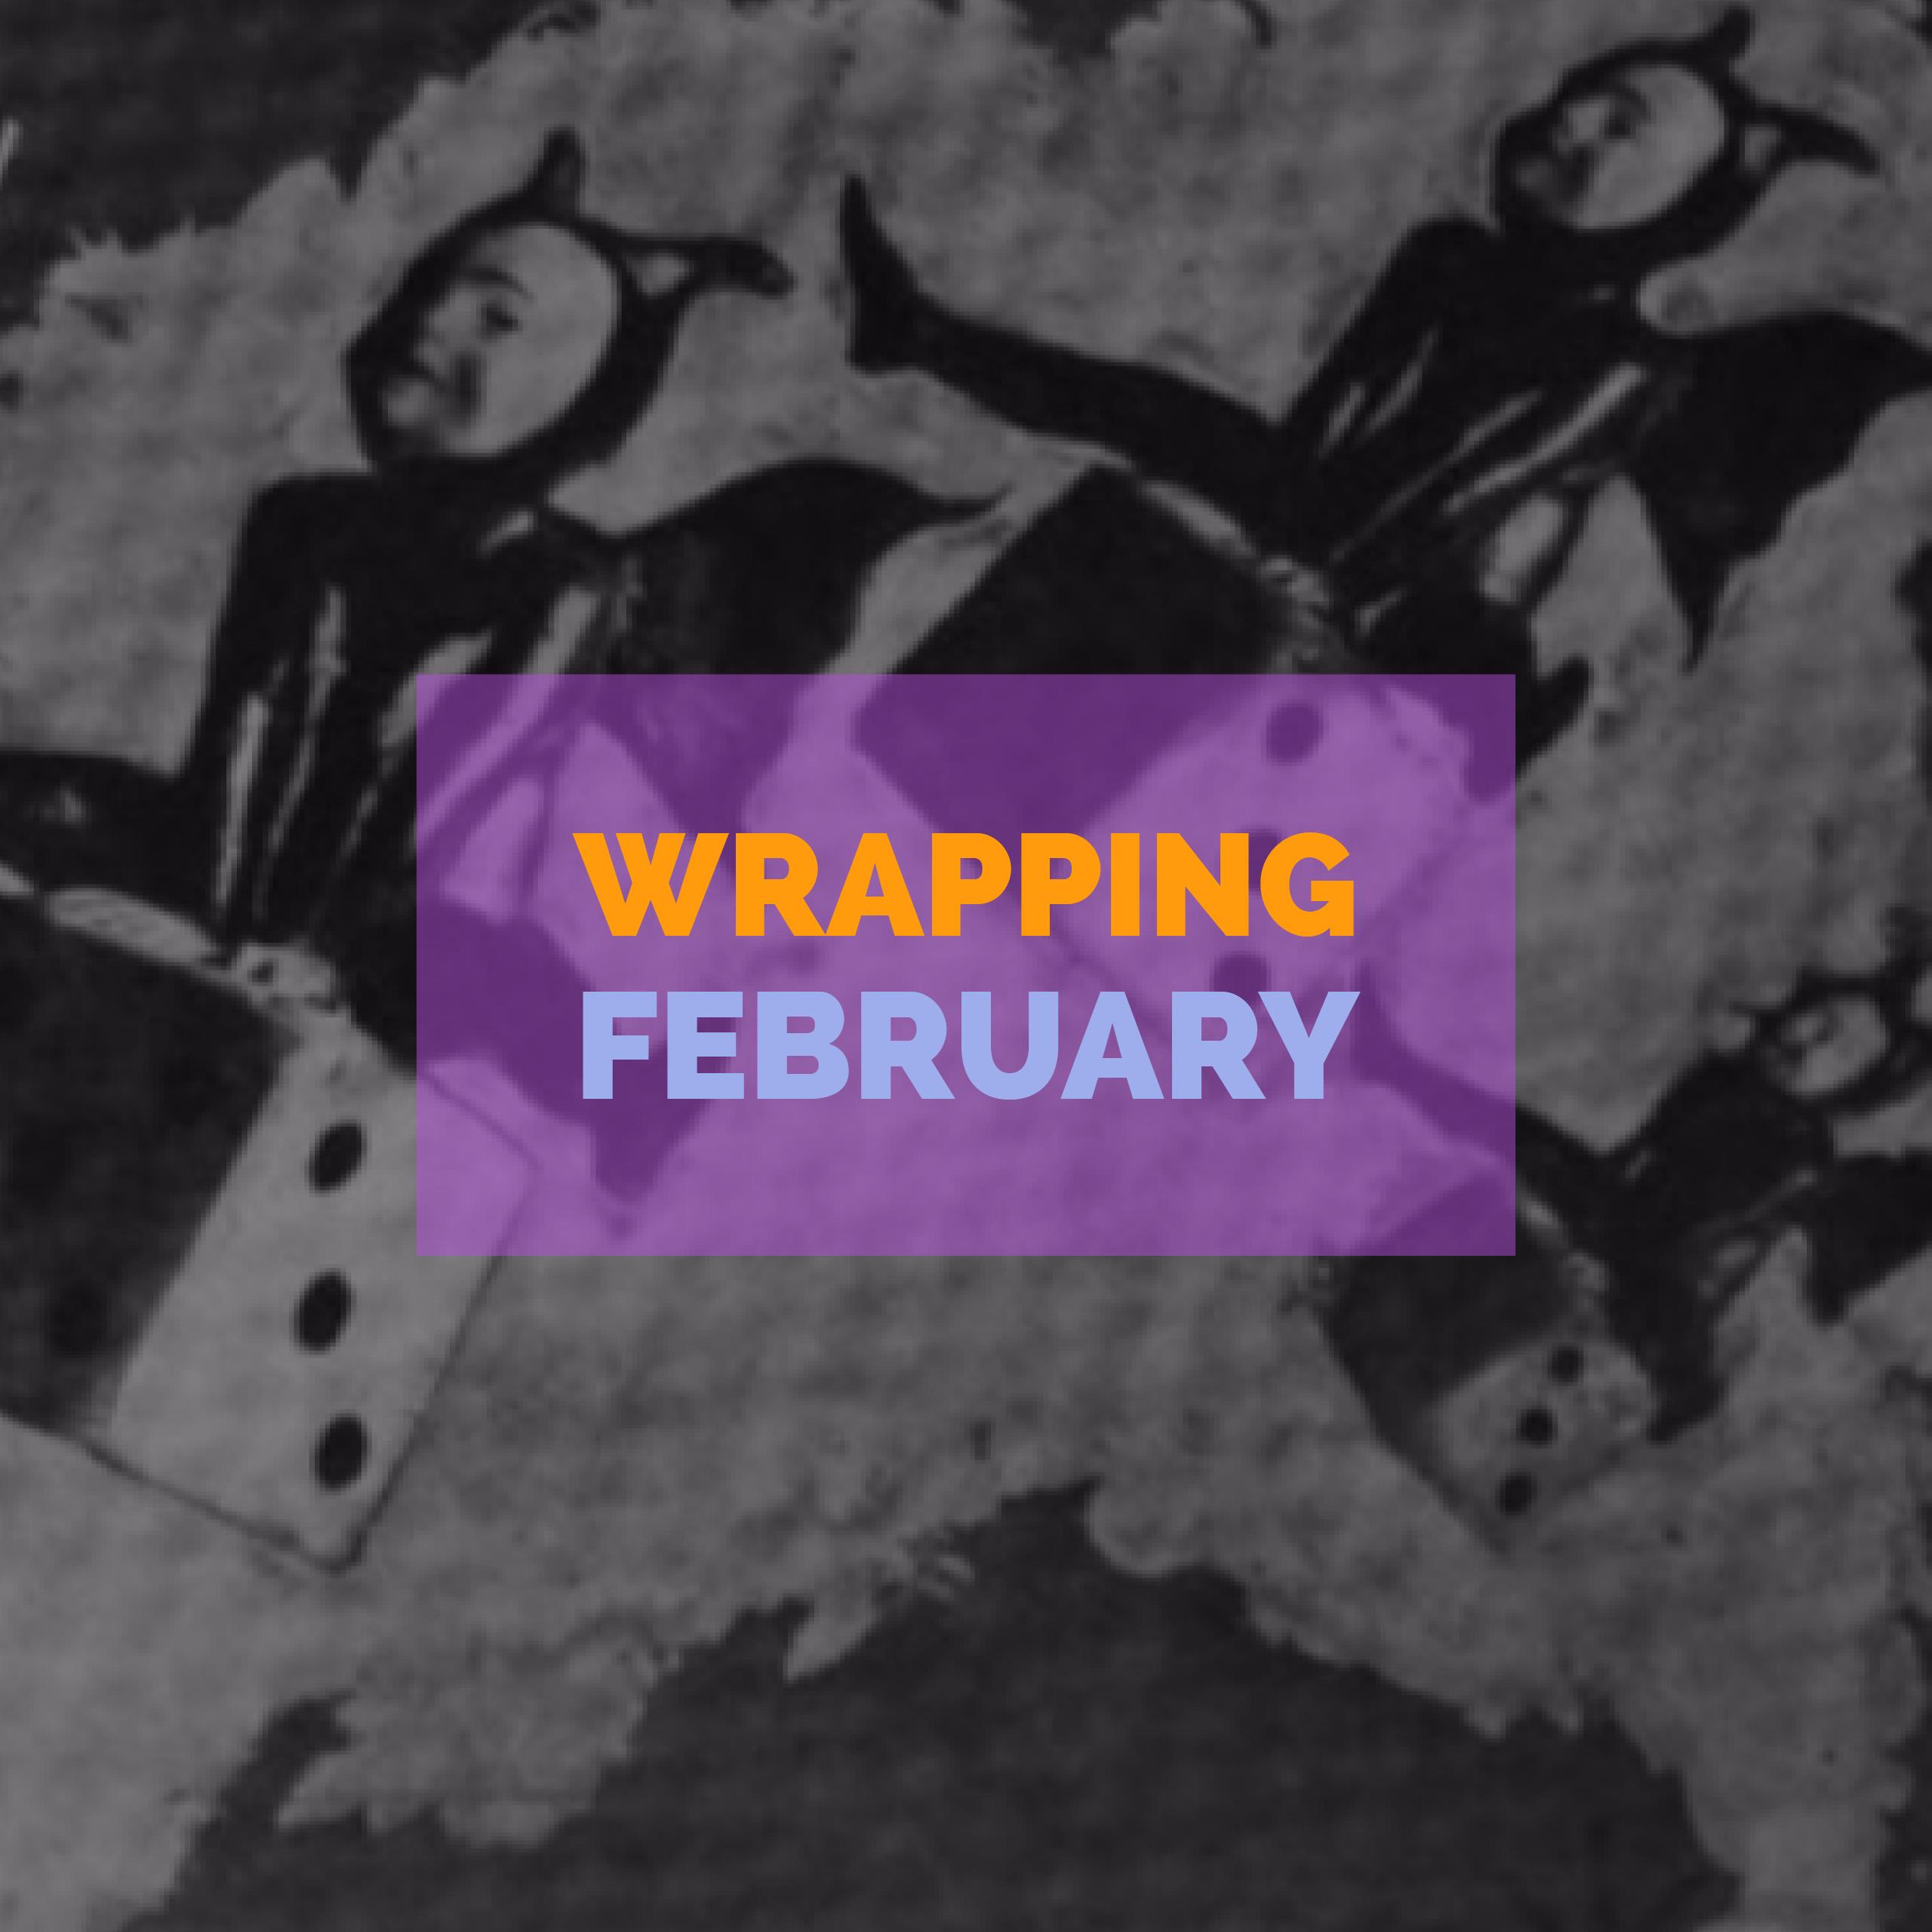 WrappingFeb